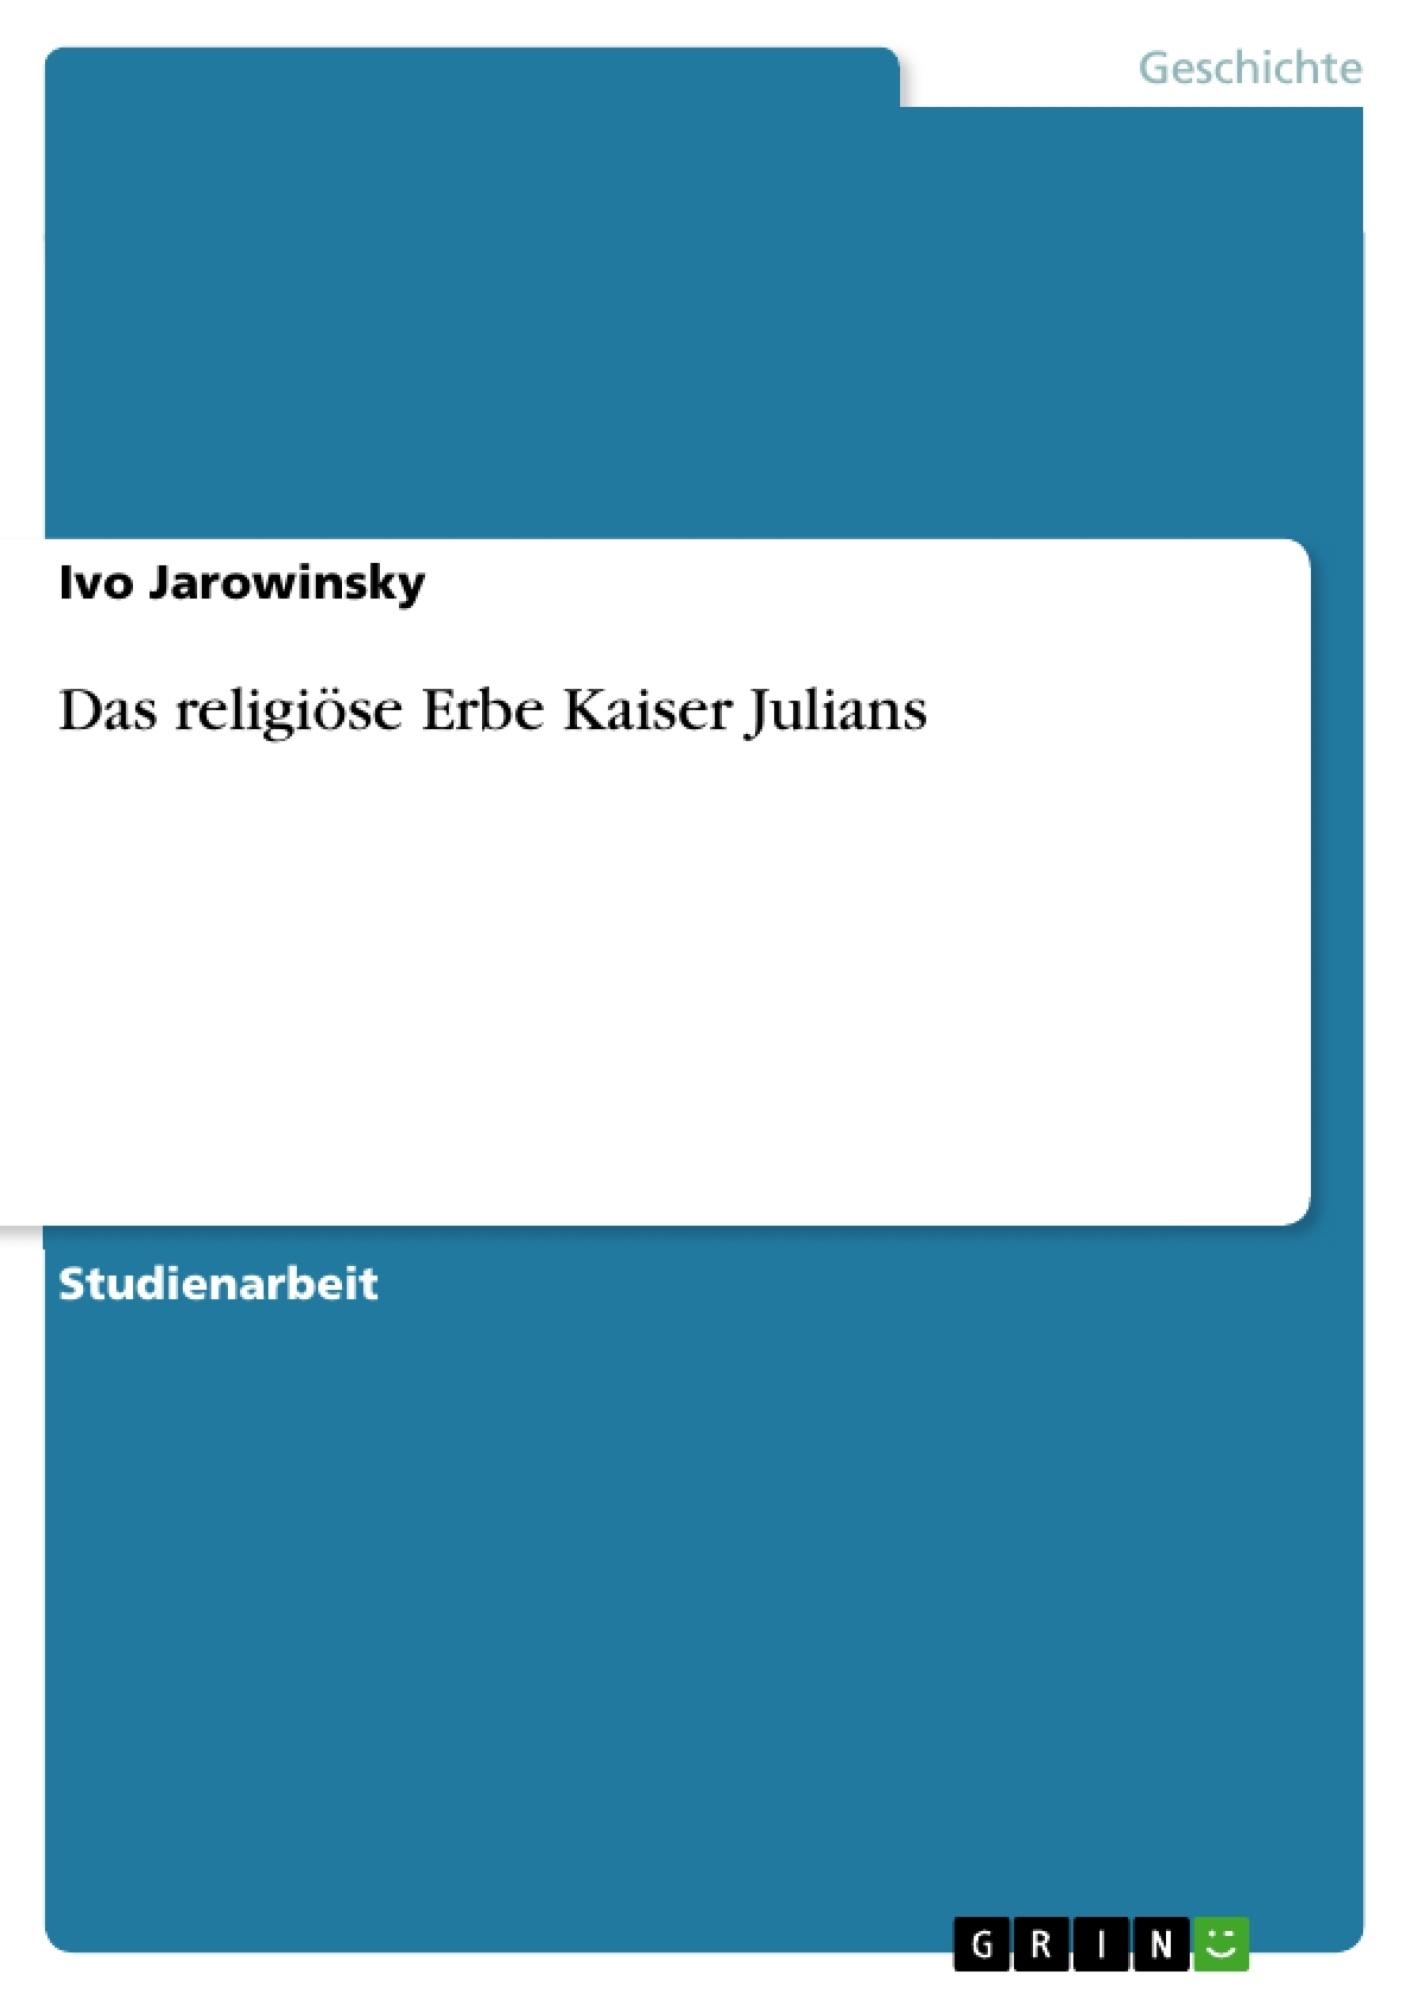 Titel: Das religiöse Erbe Kaiser Julians